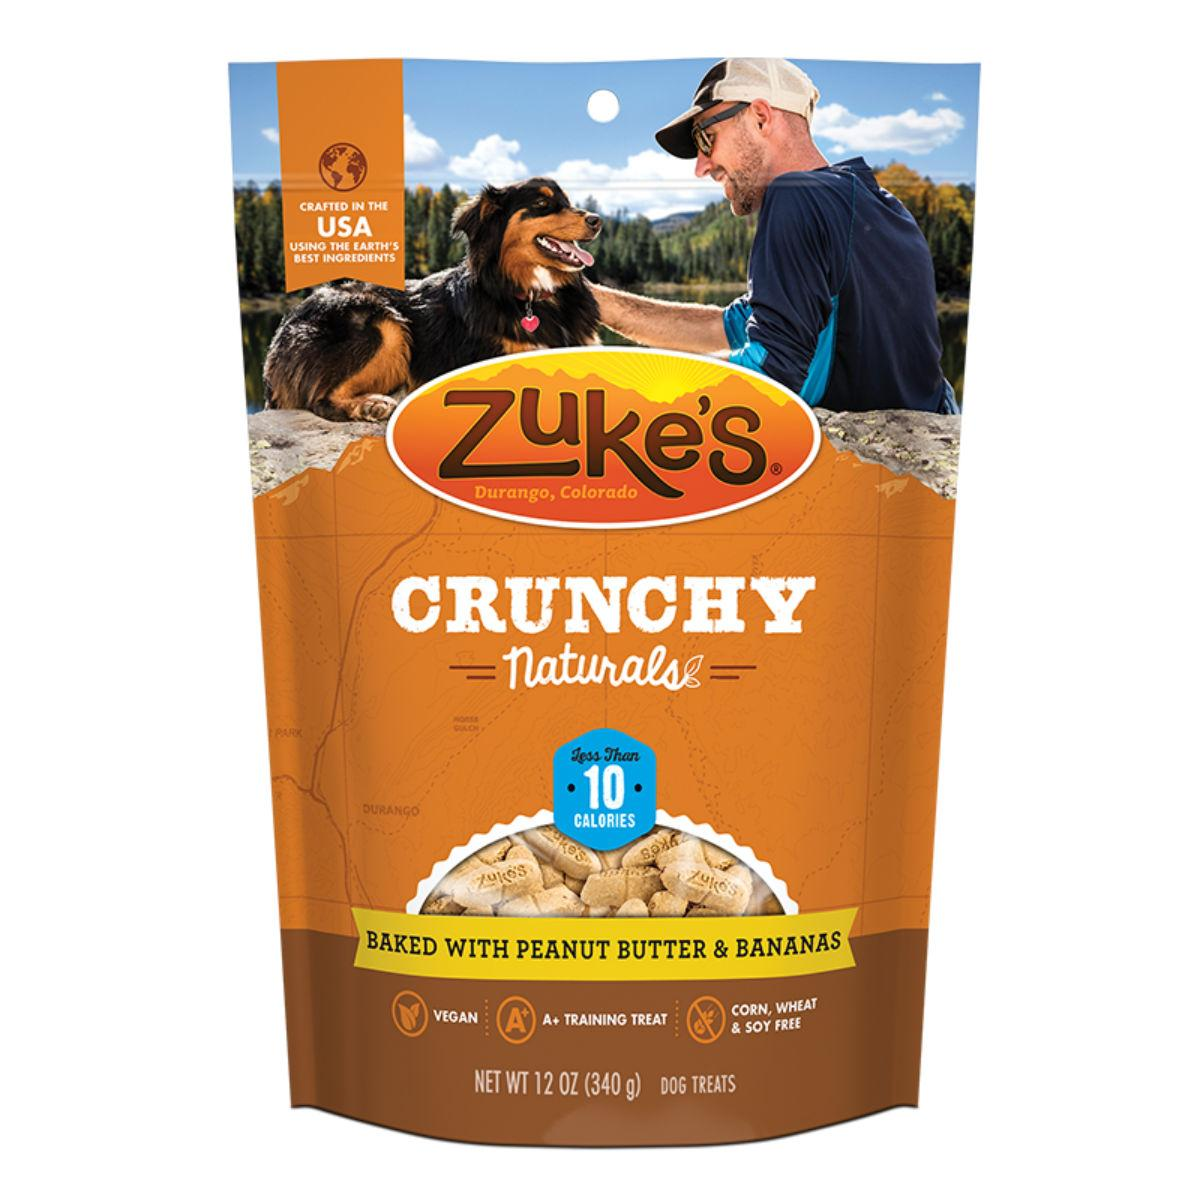 Zukes Crunchy Naturals Dog Treats - Peanut Butter and Bananas